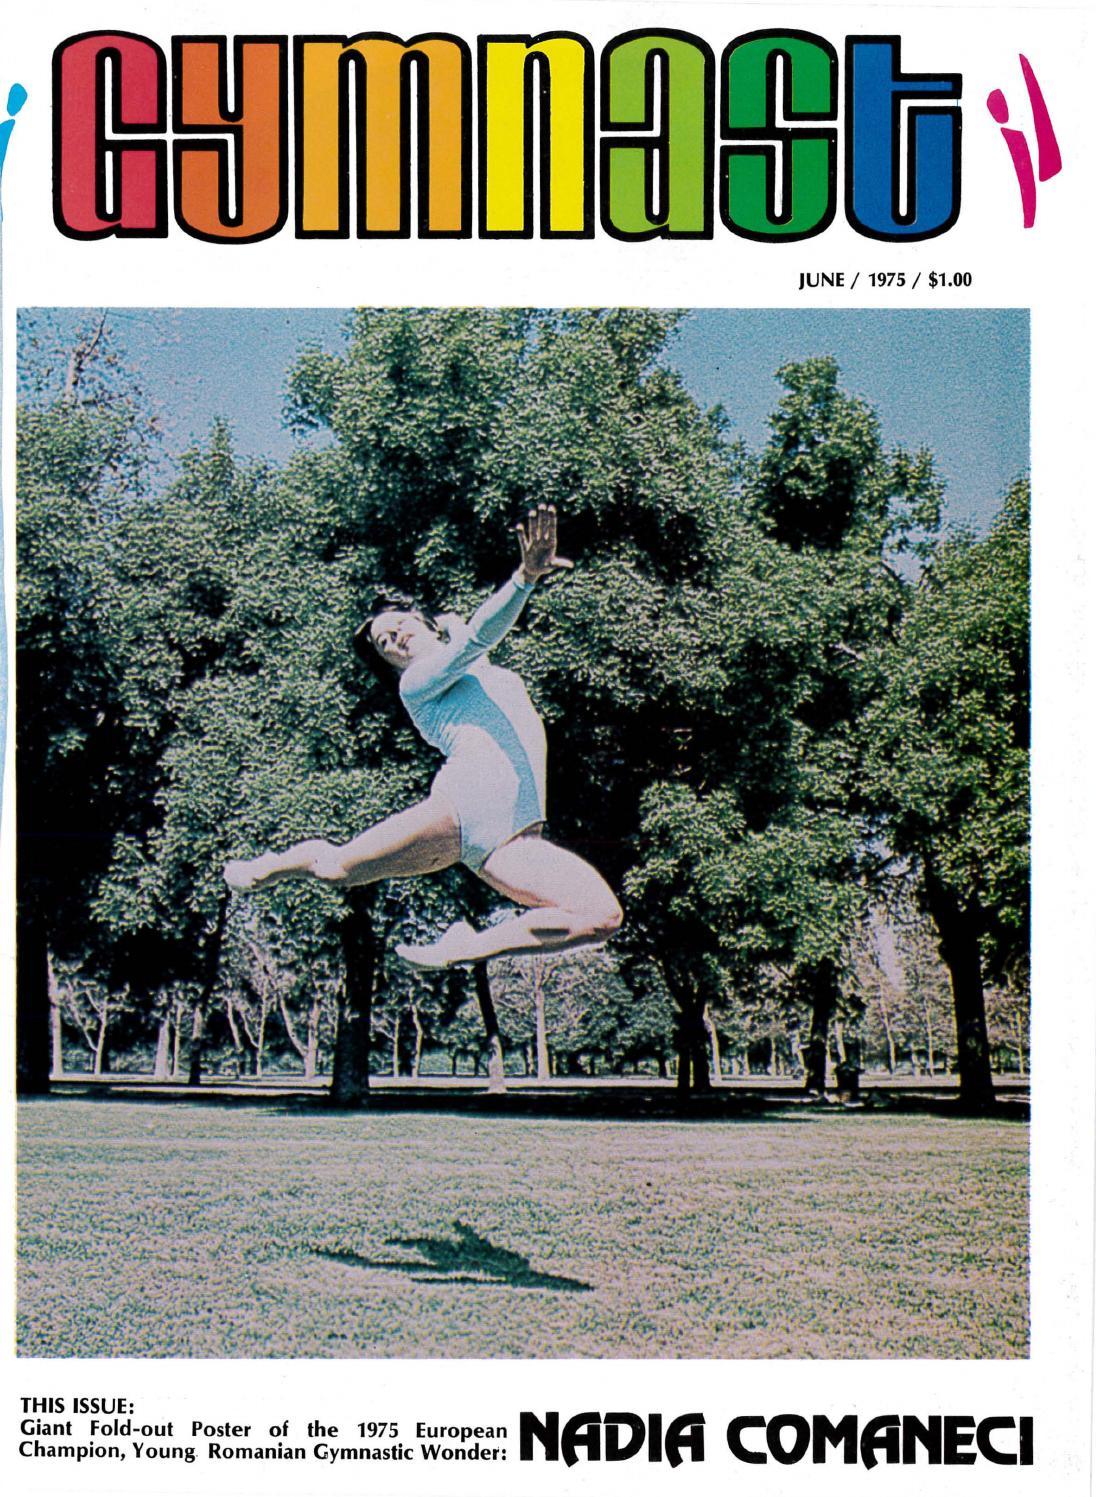 Vol 12 Steady Crazy Magazine 1 No August 1975